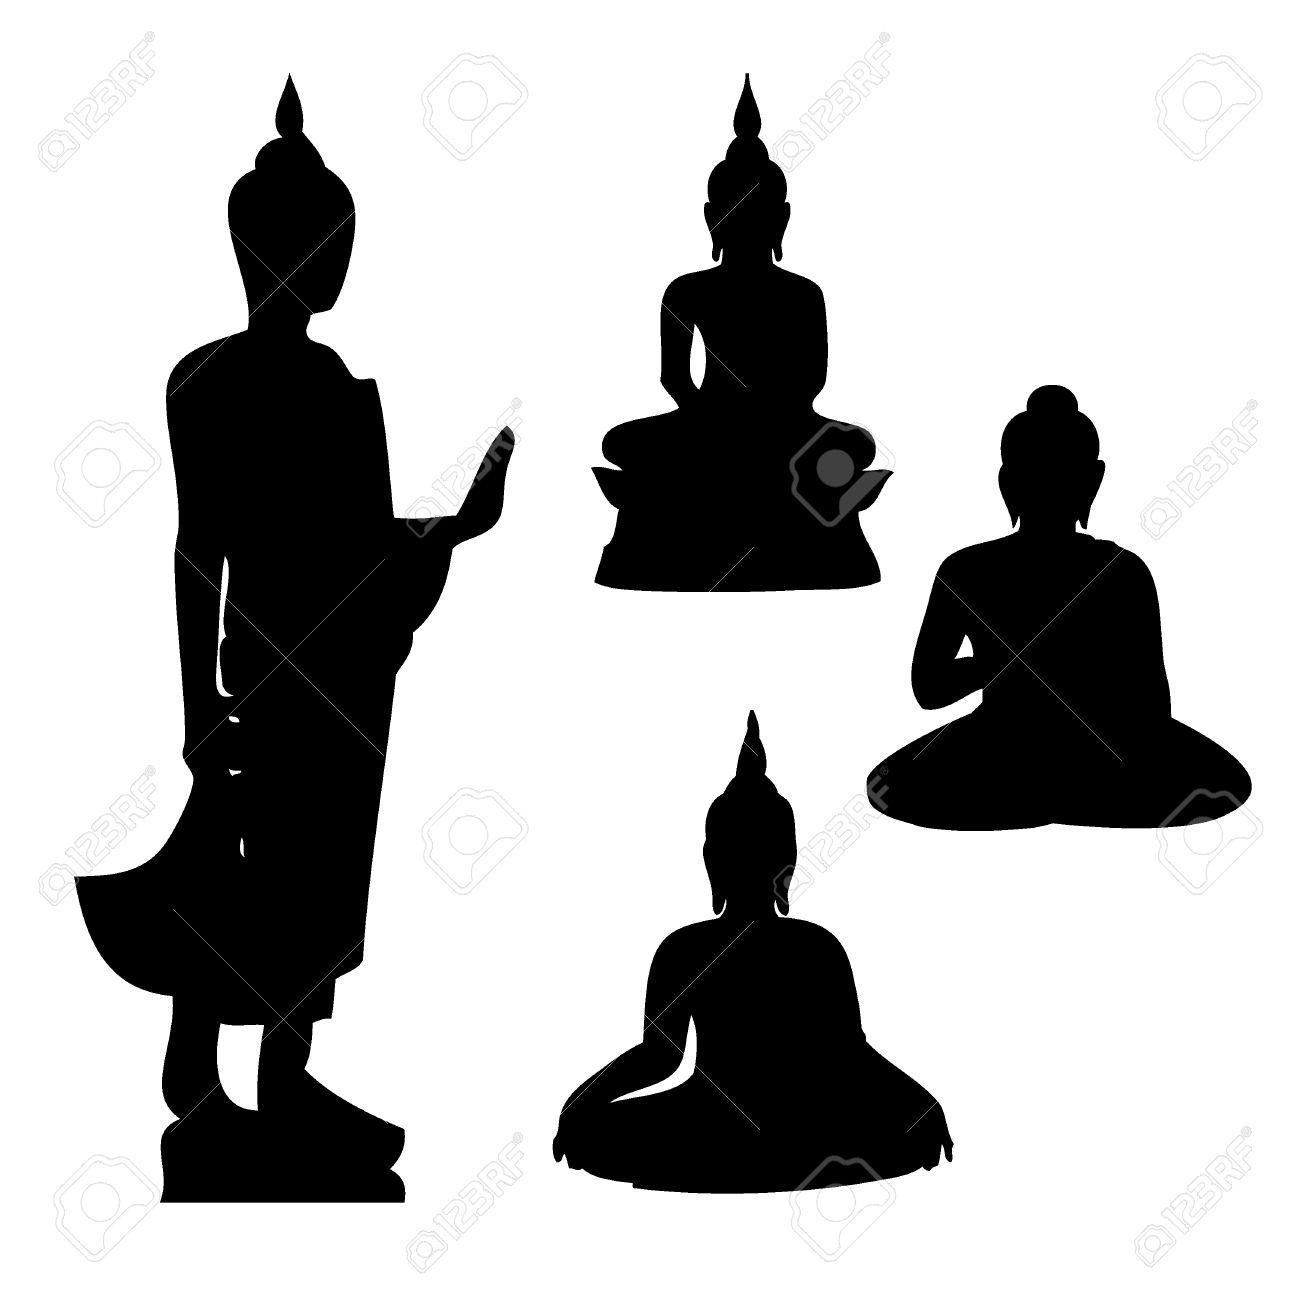 buddha vector royalty free cliparts vectors and stock illustration rh 123rf com buddha vector art free buddha vector art free